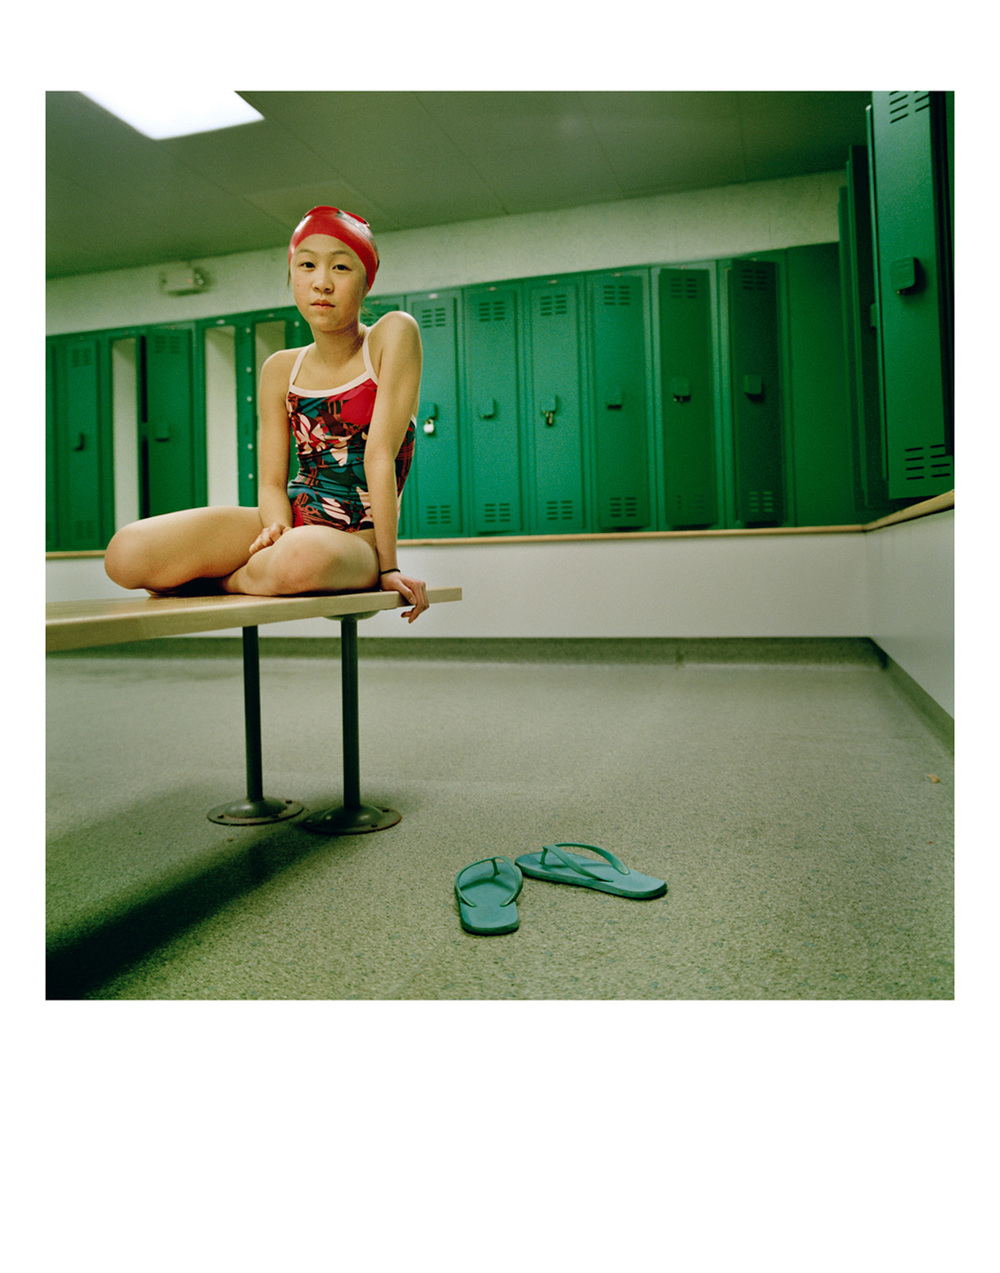 alinka_echeverria_shirlene_green.lockers.jpg